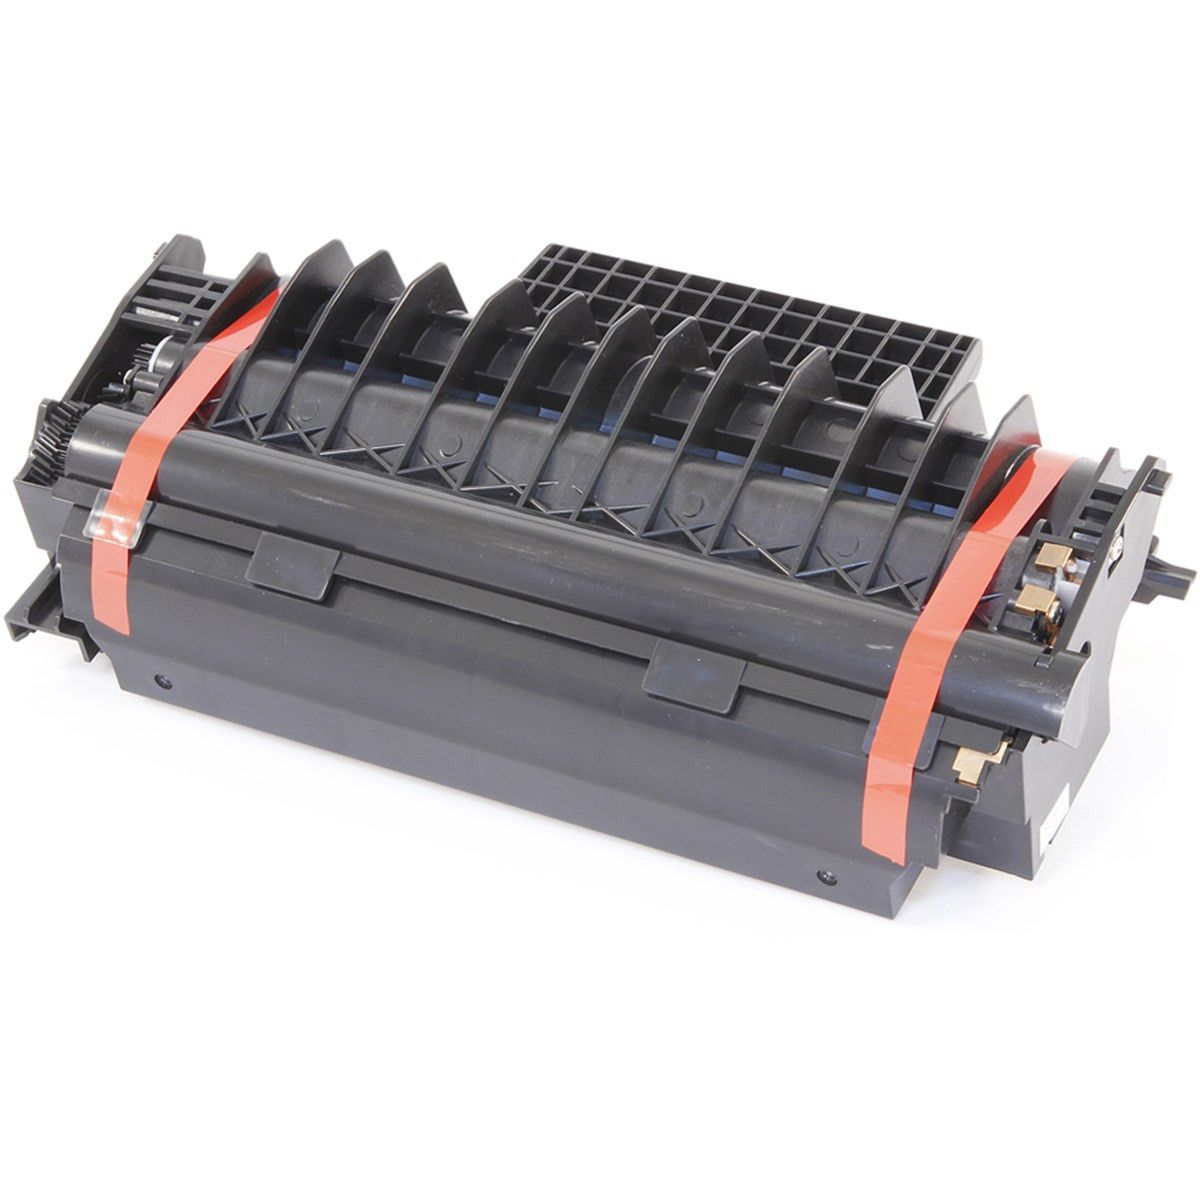 Toner compatível XEROX PHASER 3100 | 106R01379 - 4.000 Páginas - Cartucho & Cia